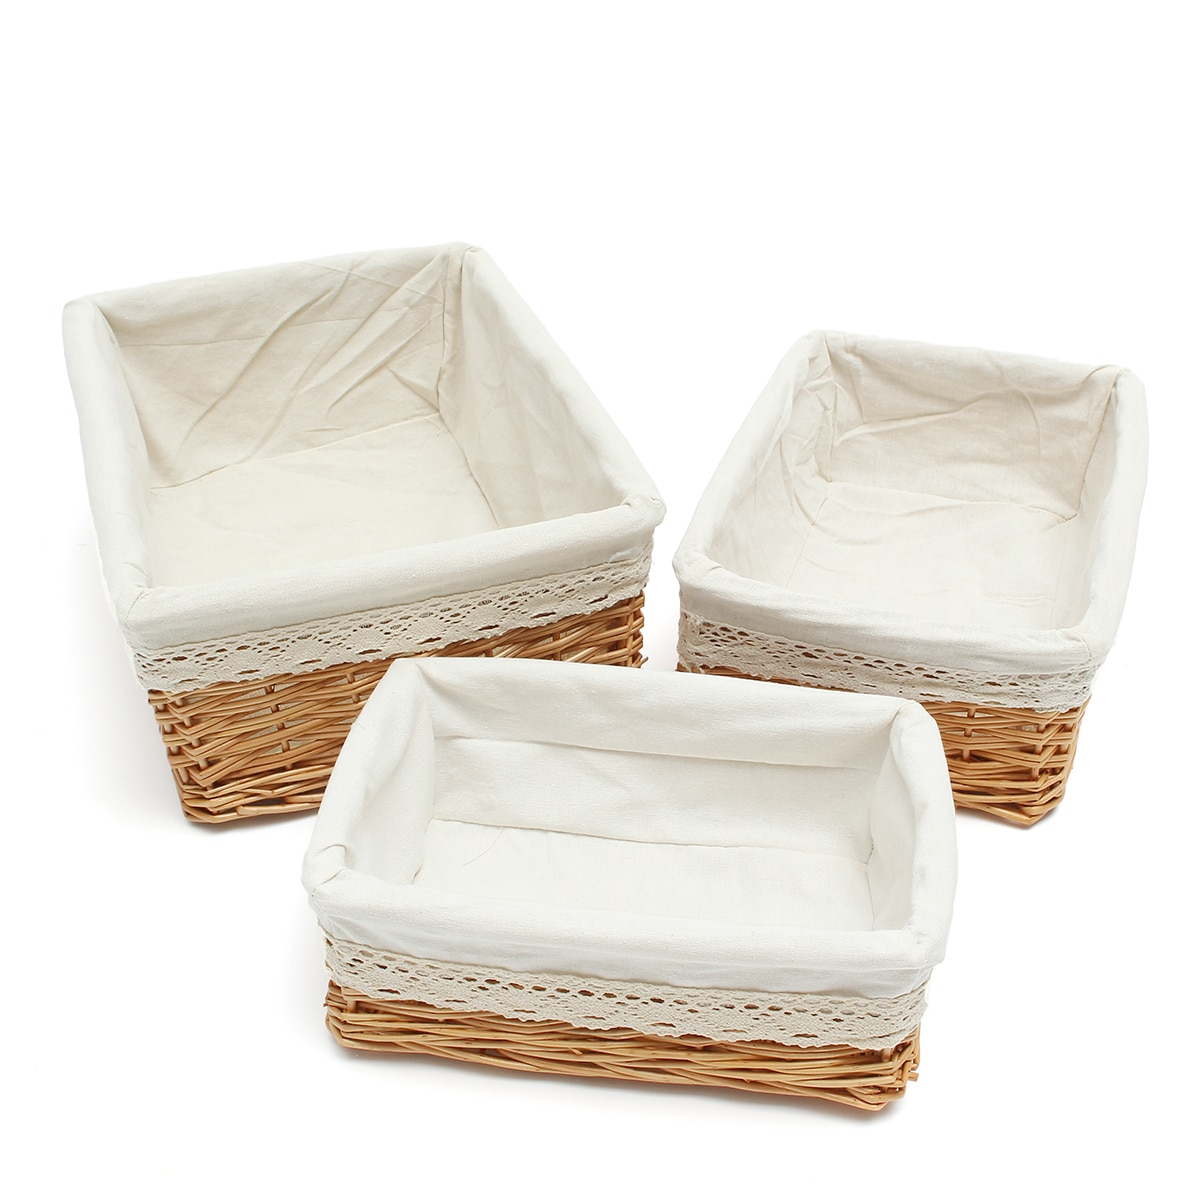 35*25*13cm cesta de almacenamiento Rectangular multiusos de mimbre con revestimiento lavable extraíble de sauce tejido contenedores-tamaño M